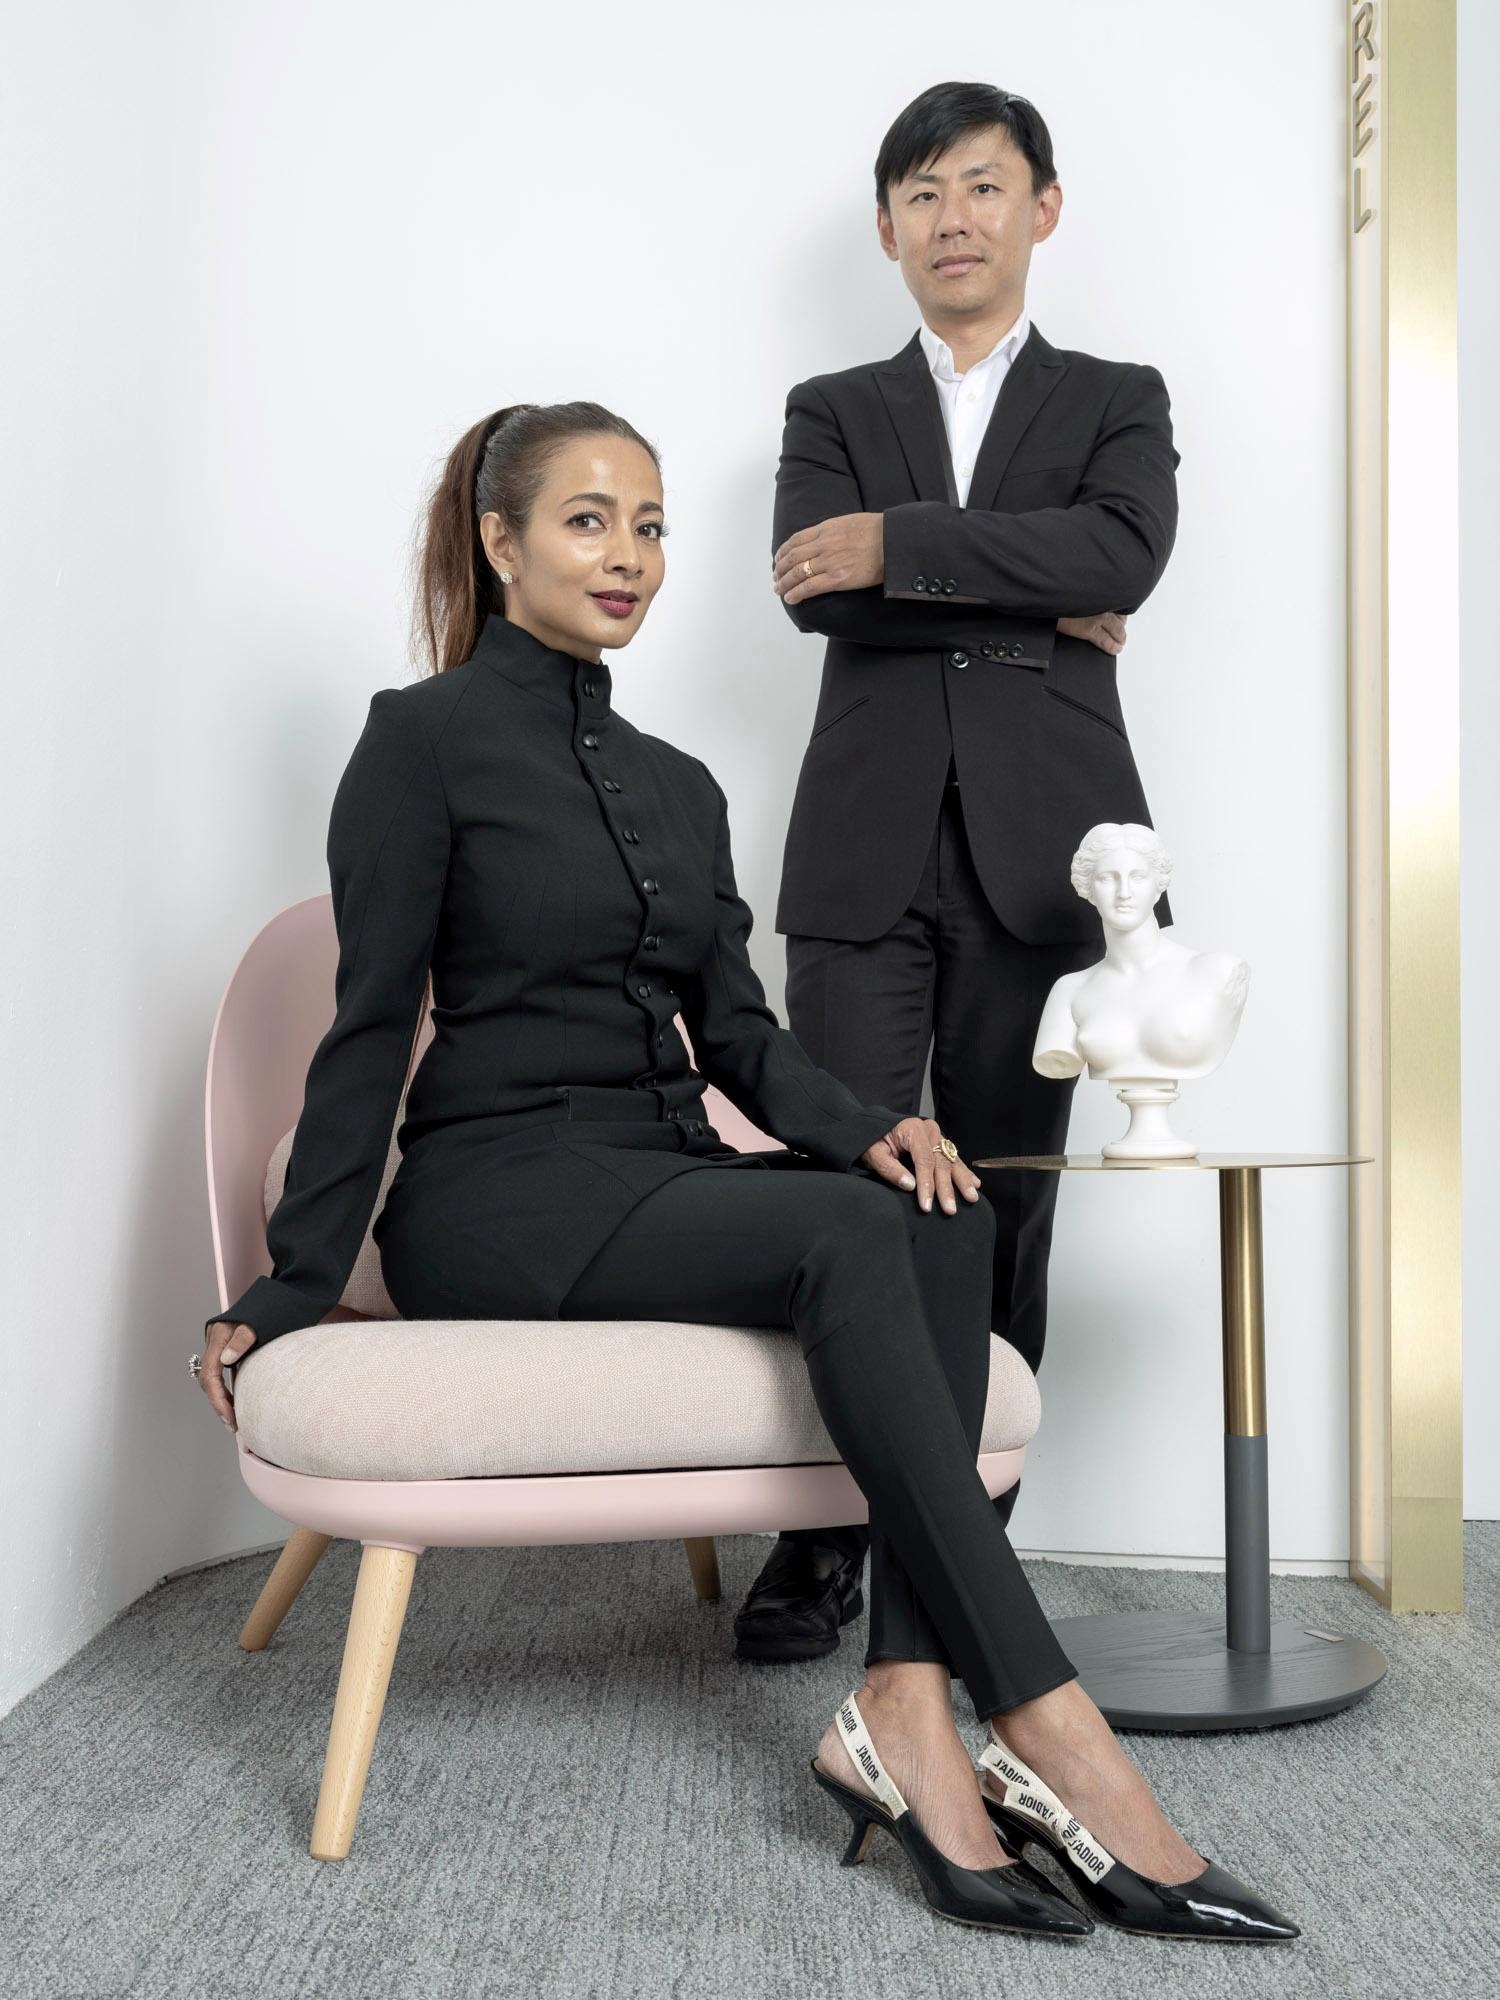 Corporate headshot portrait linkedin profil photography studio singapore services asia photographer dr chua clinic